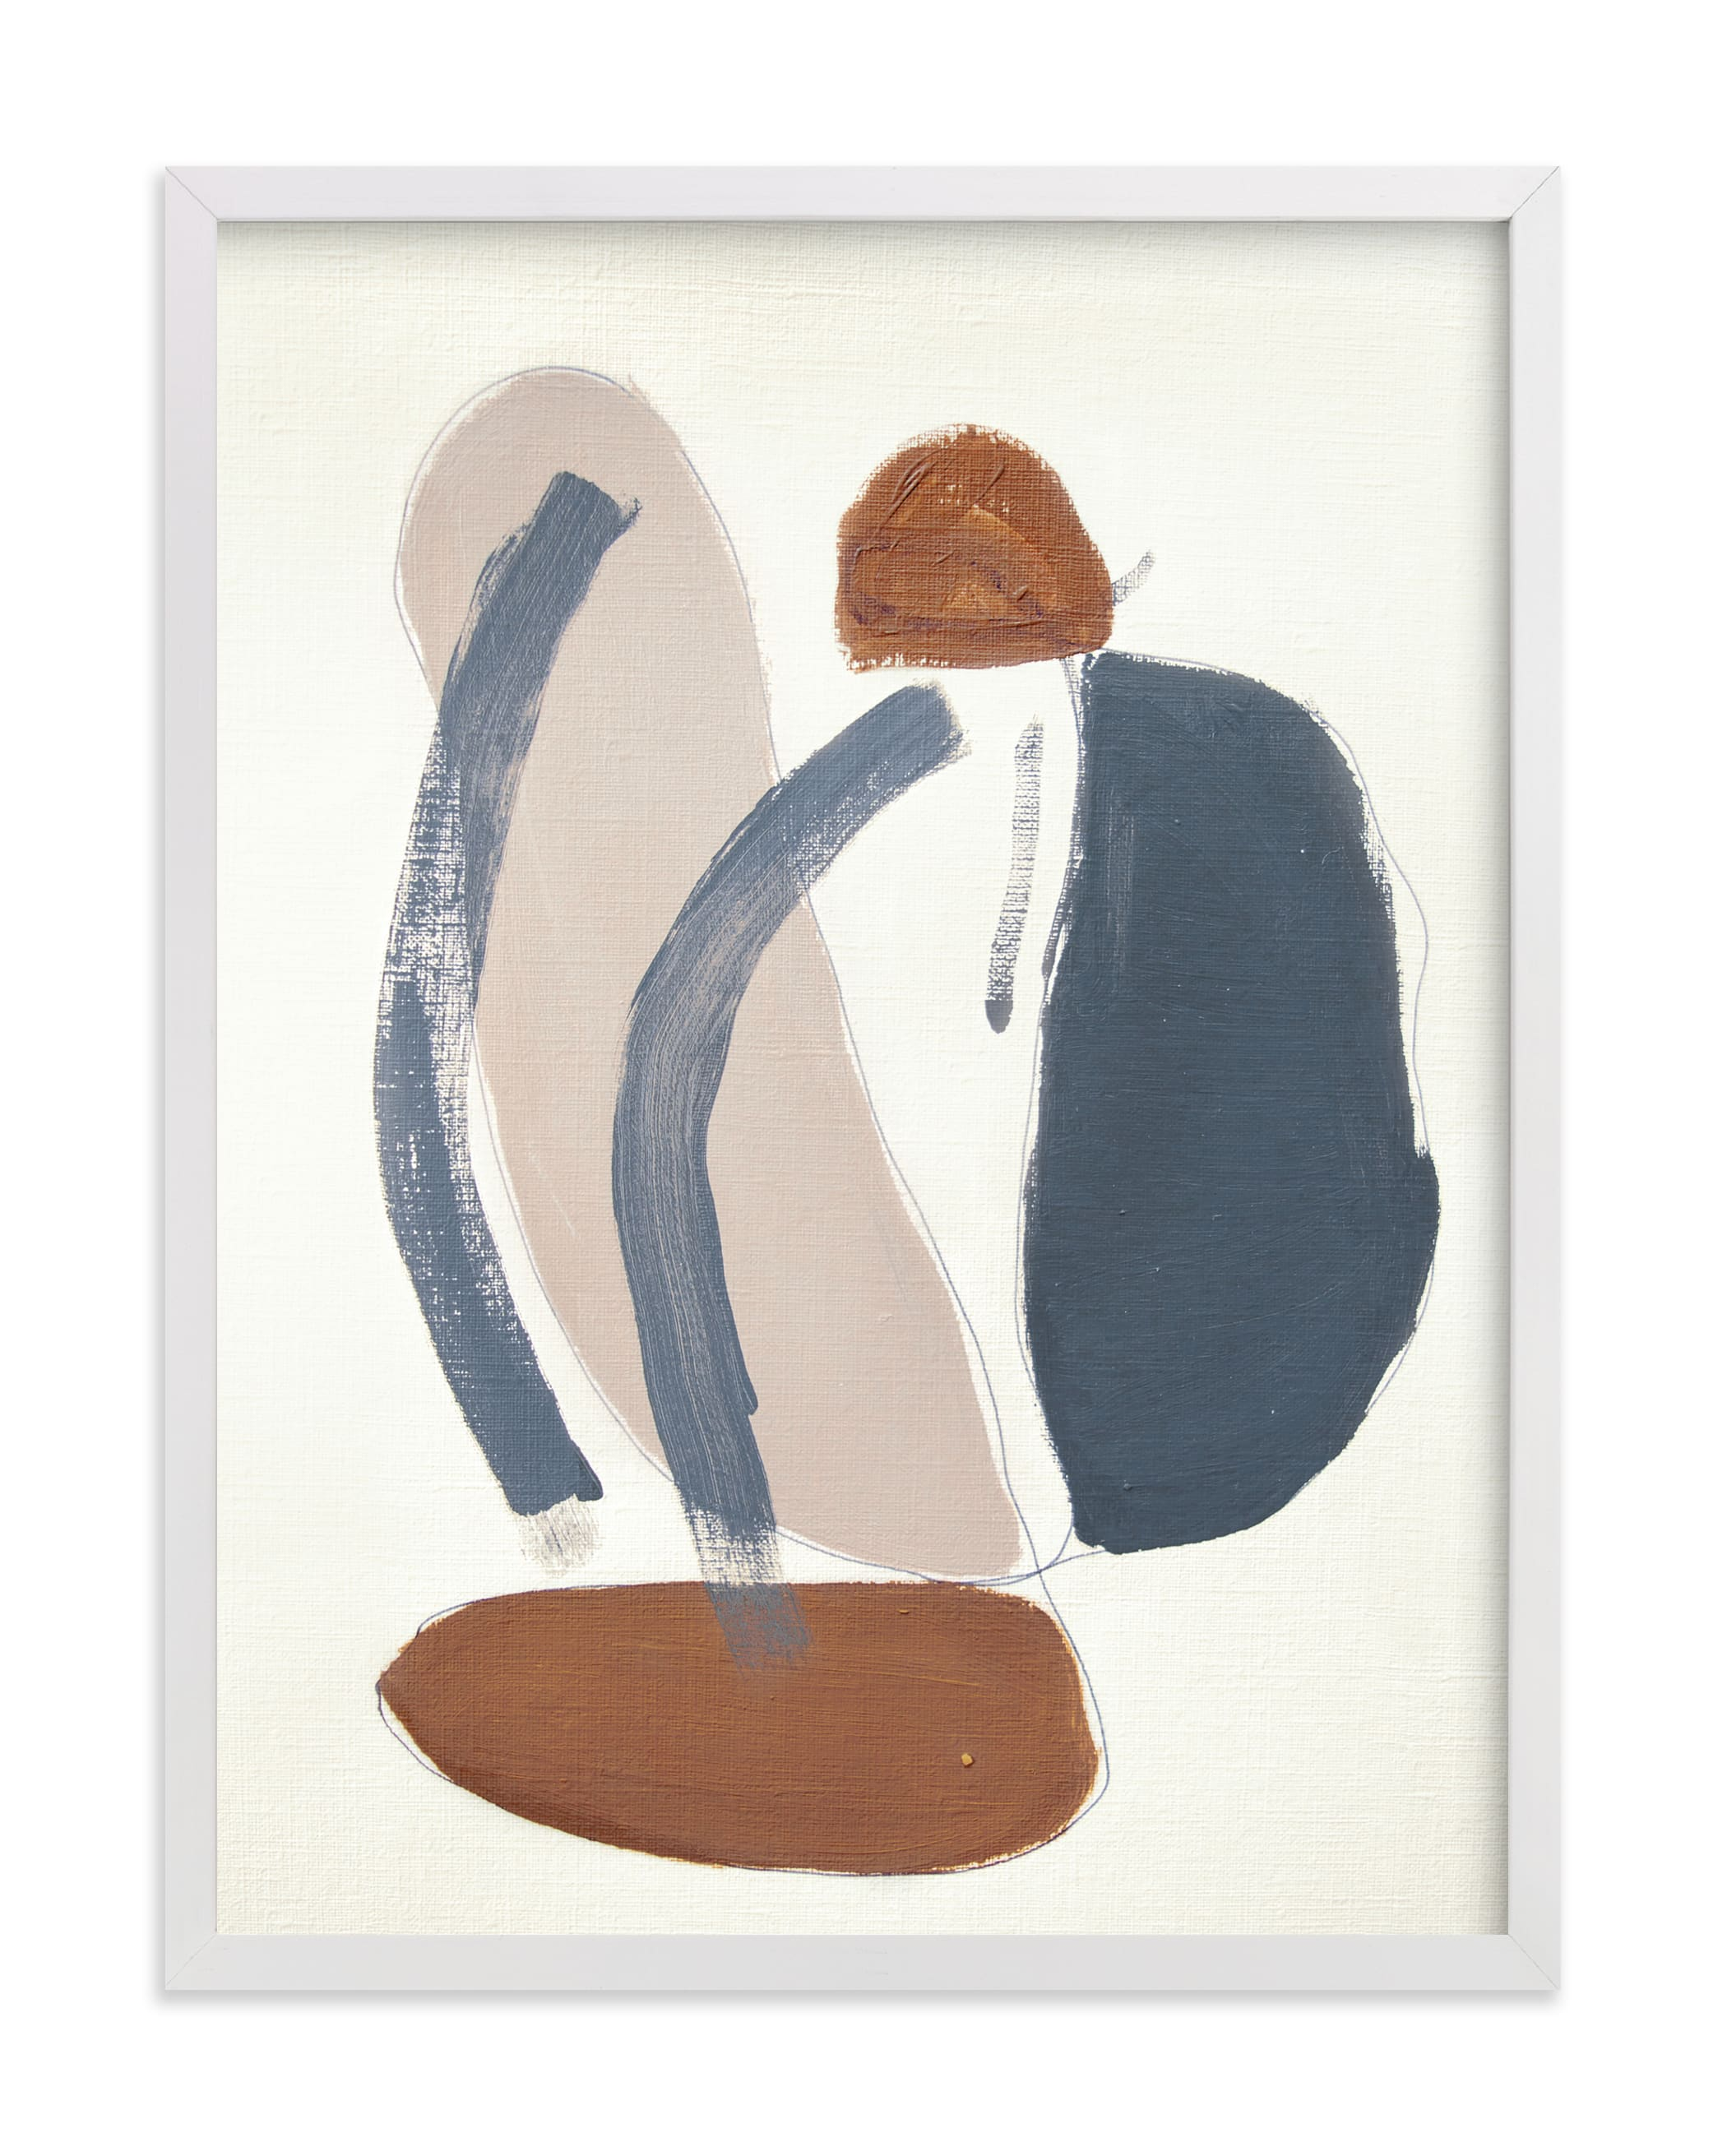 This is a blue art by Kara Schlabaugh called Tracks No. 3.